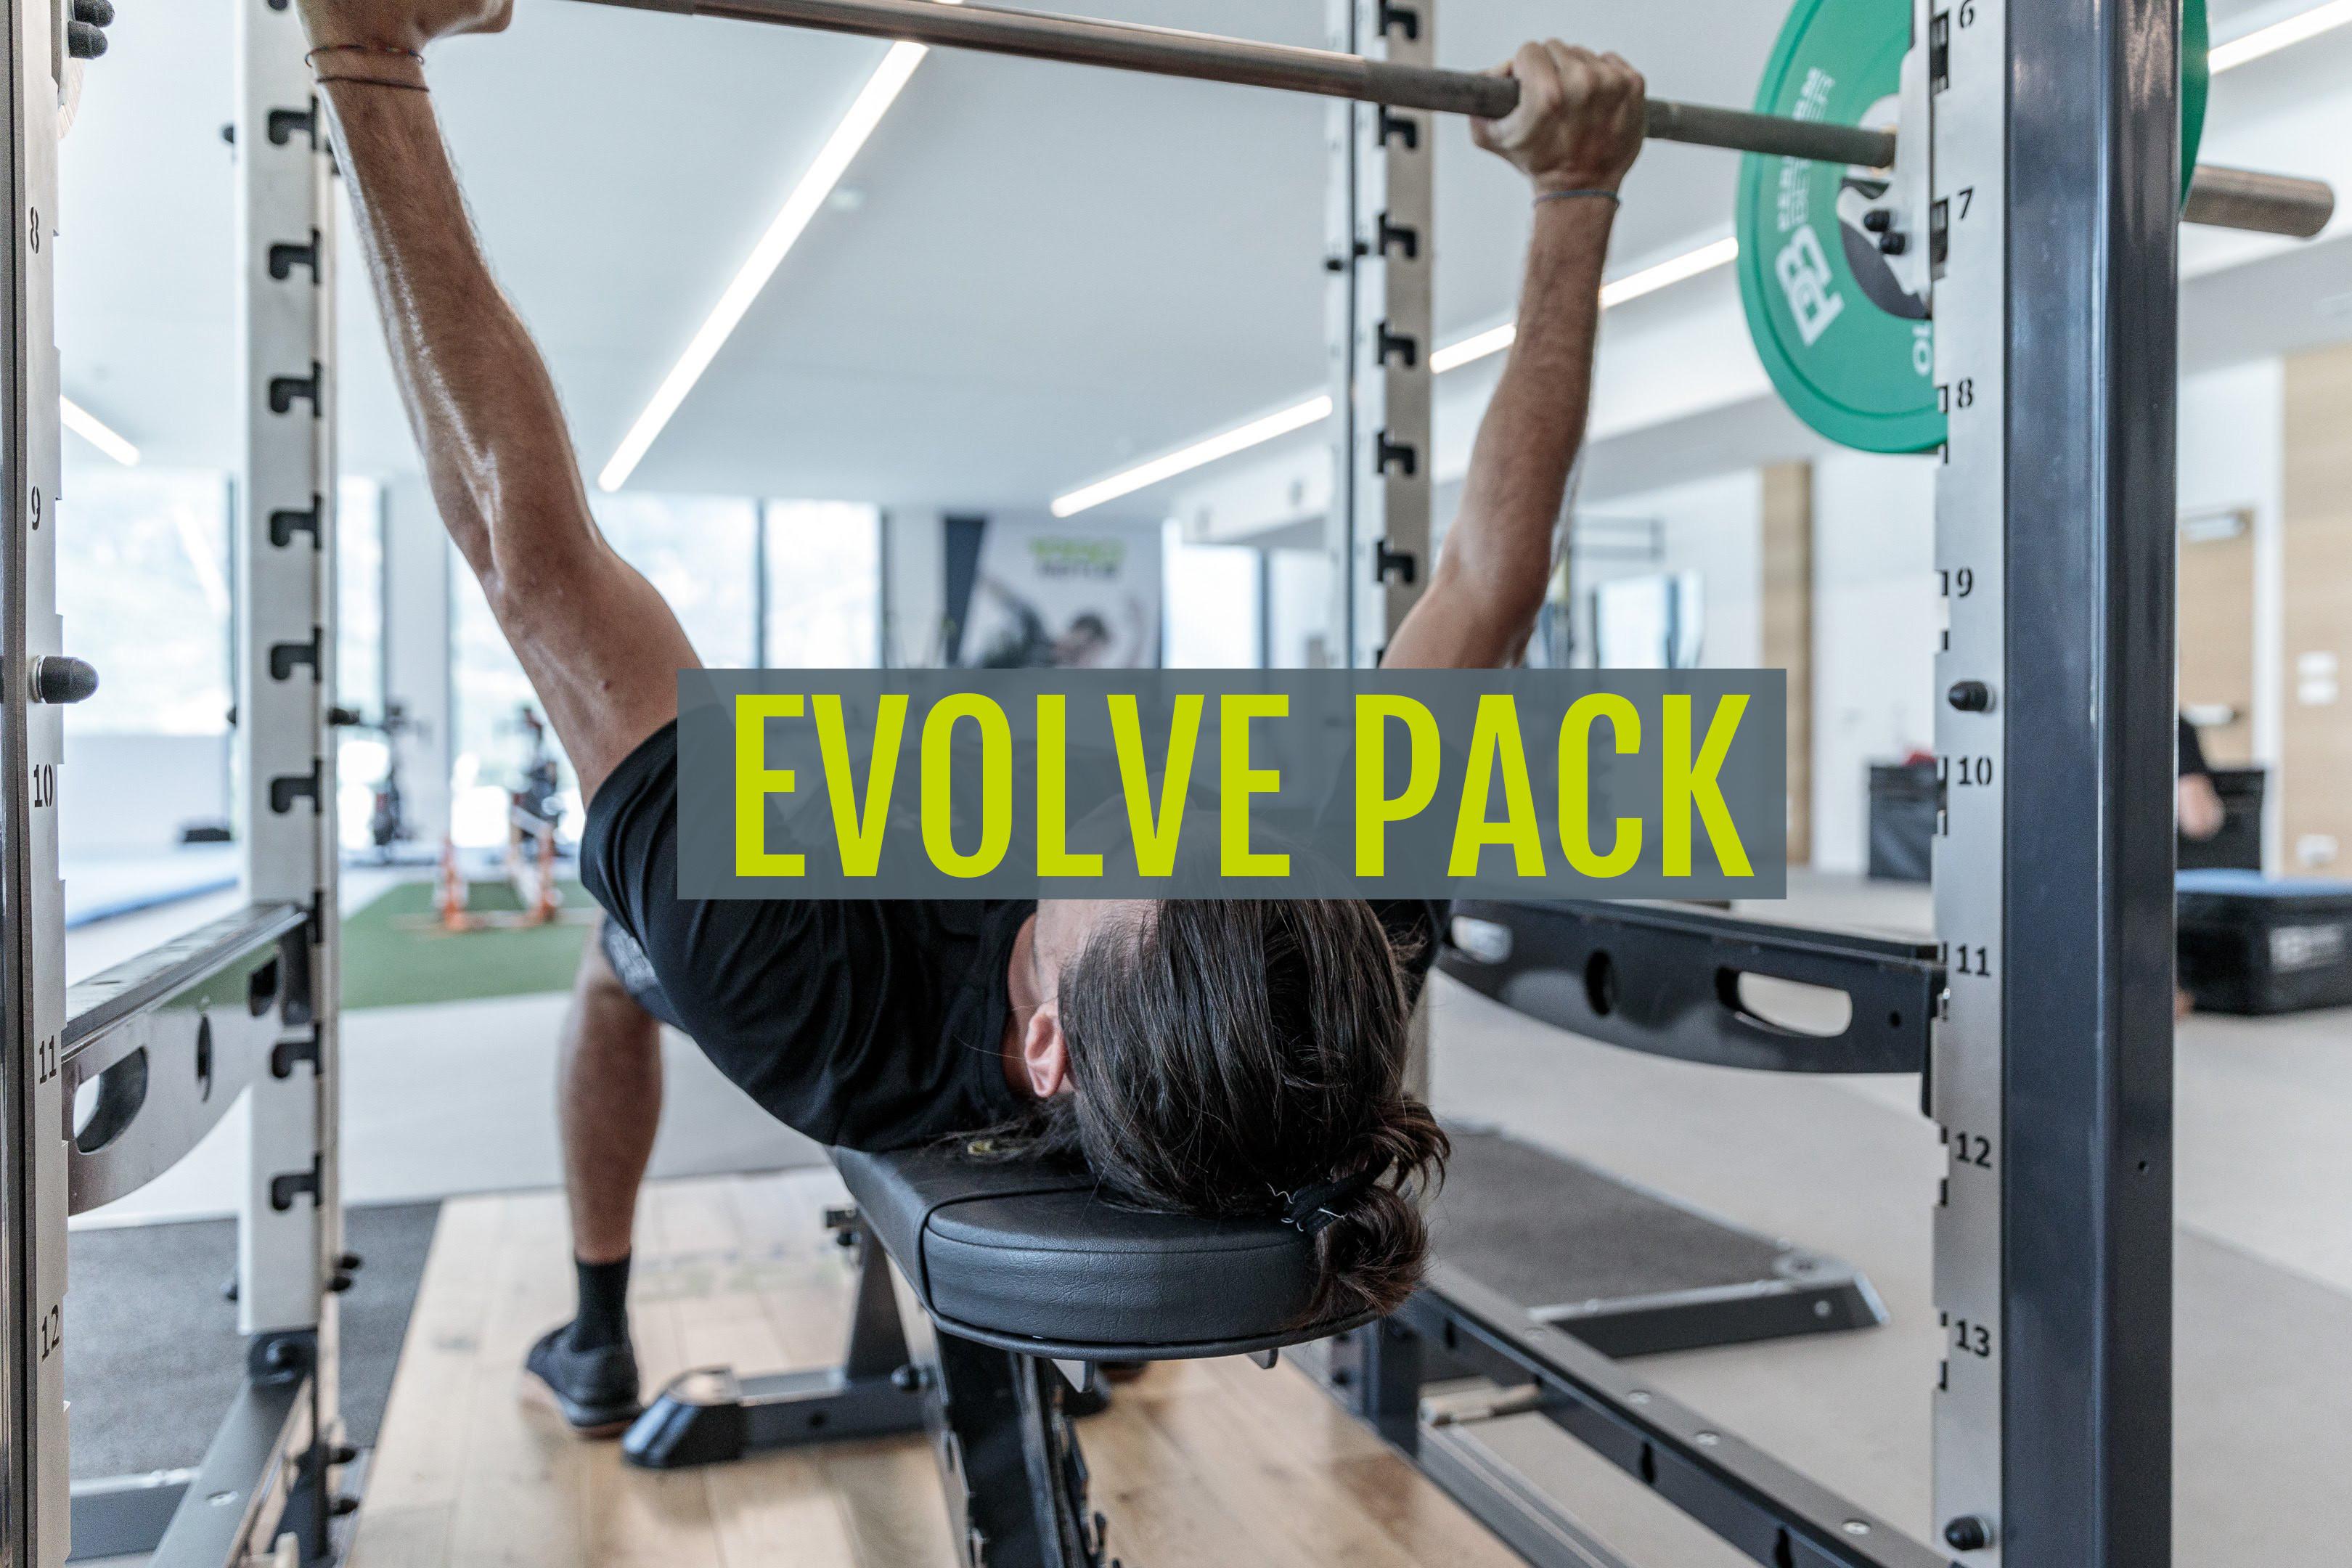 Tennis - Evolve Pack